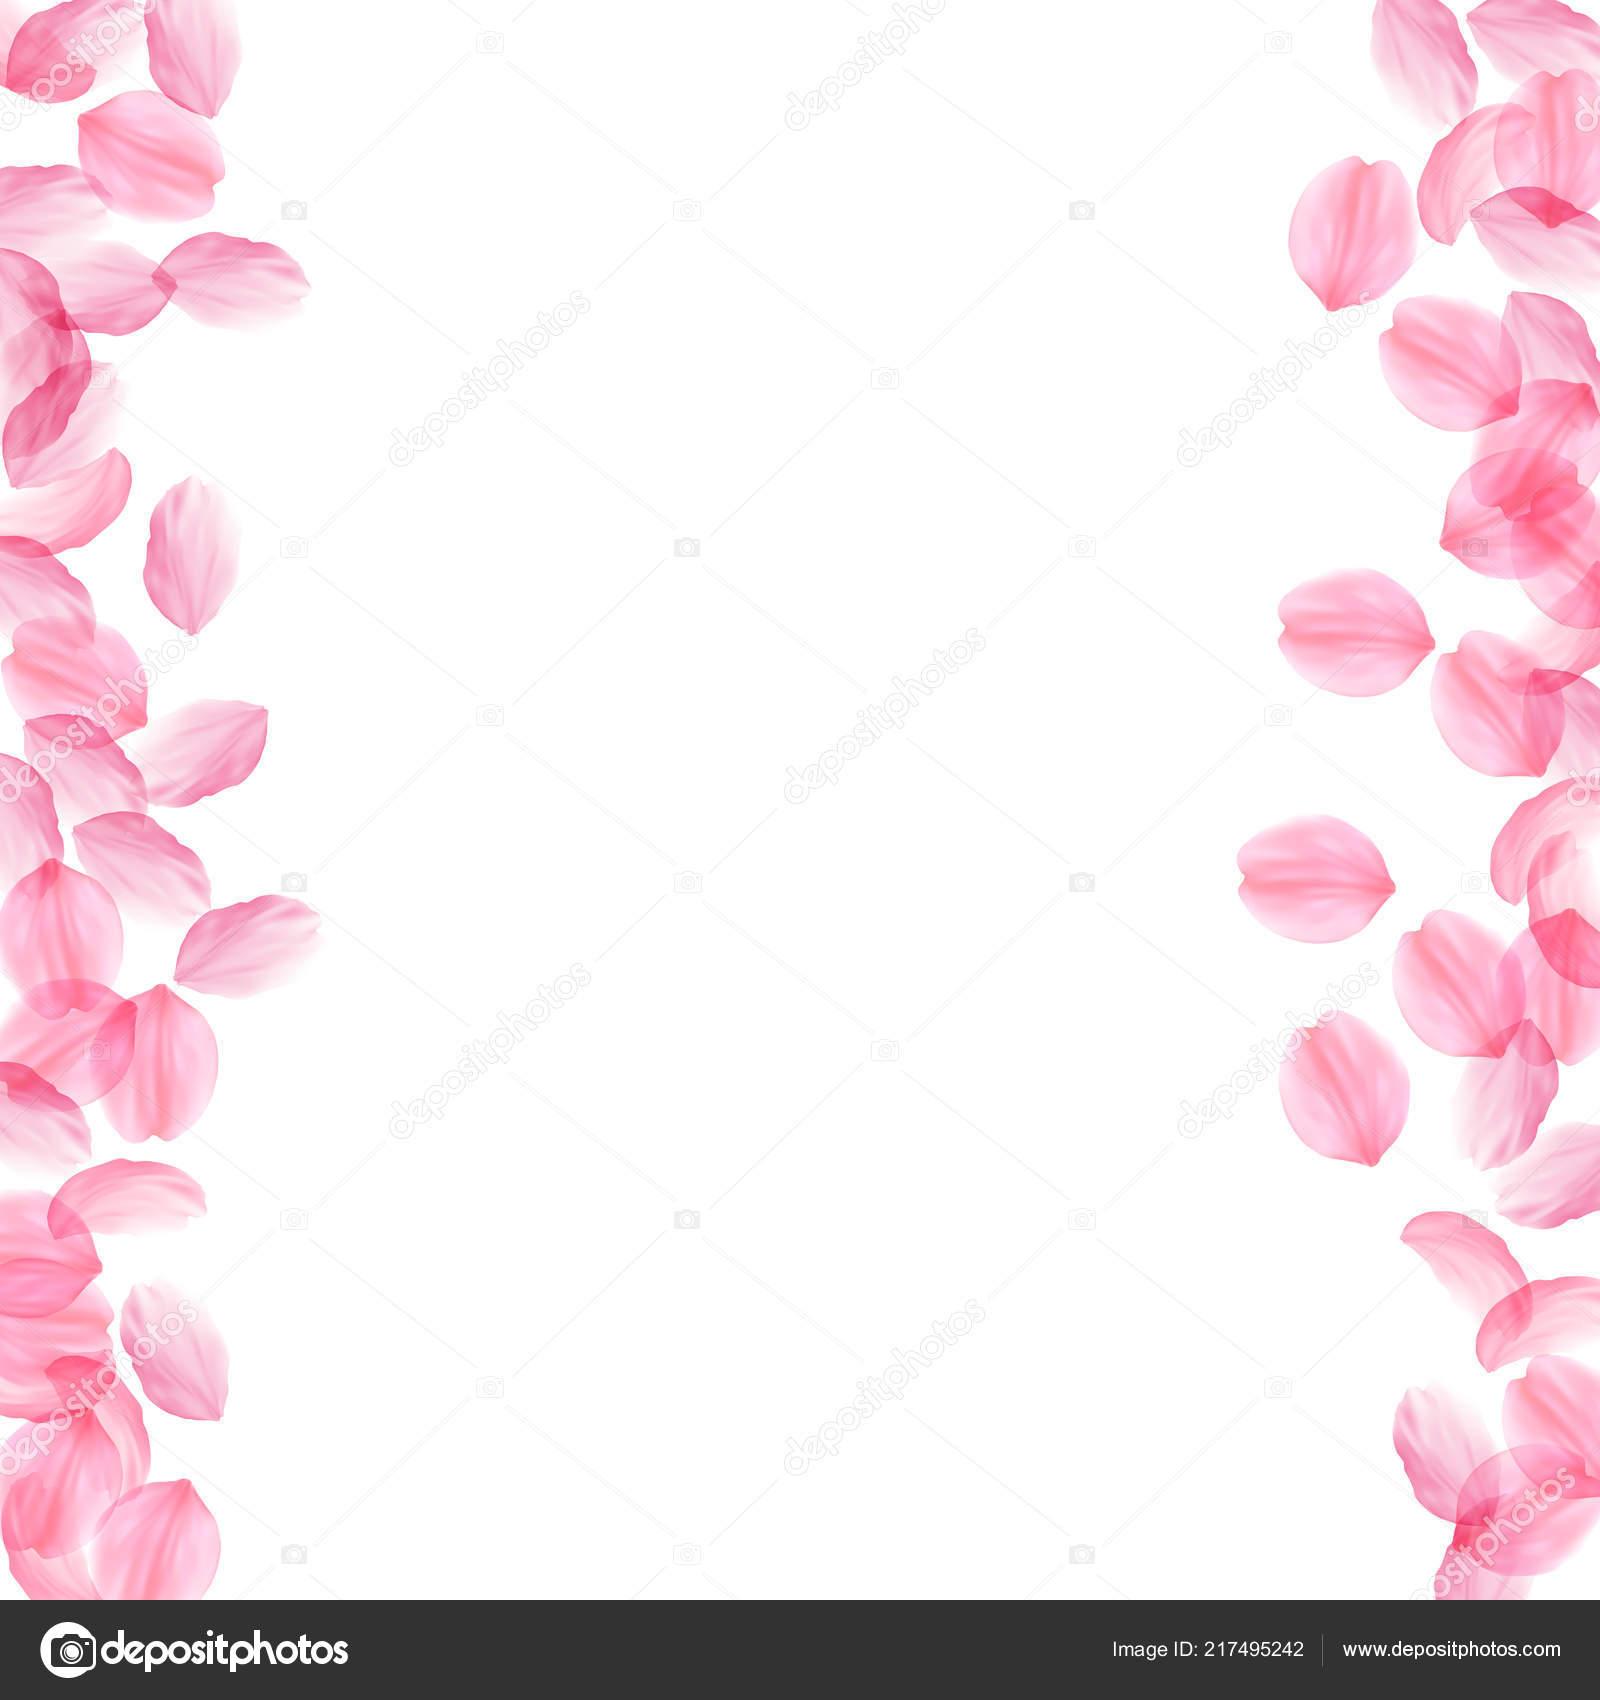 Sakura Petals Falling Down Romantic Pink Silky Big Flowers Thick